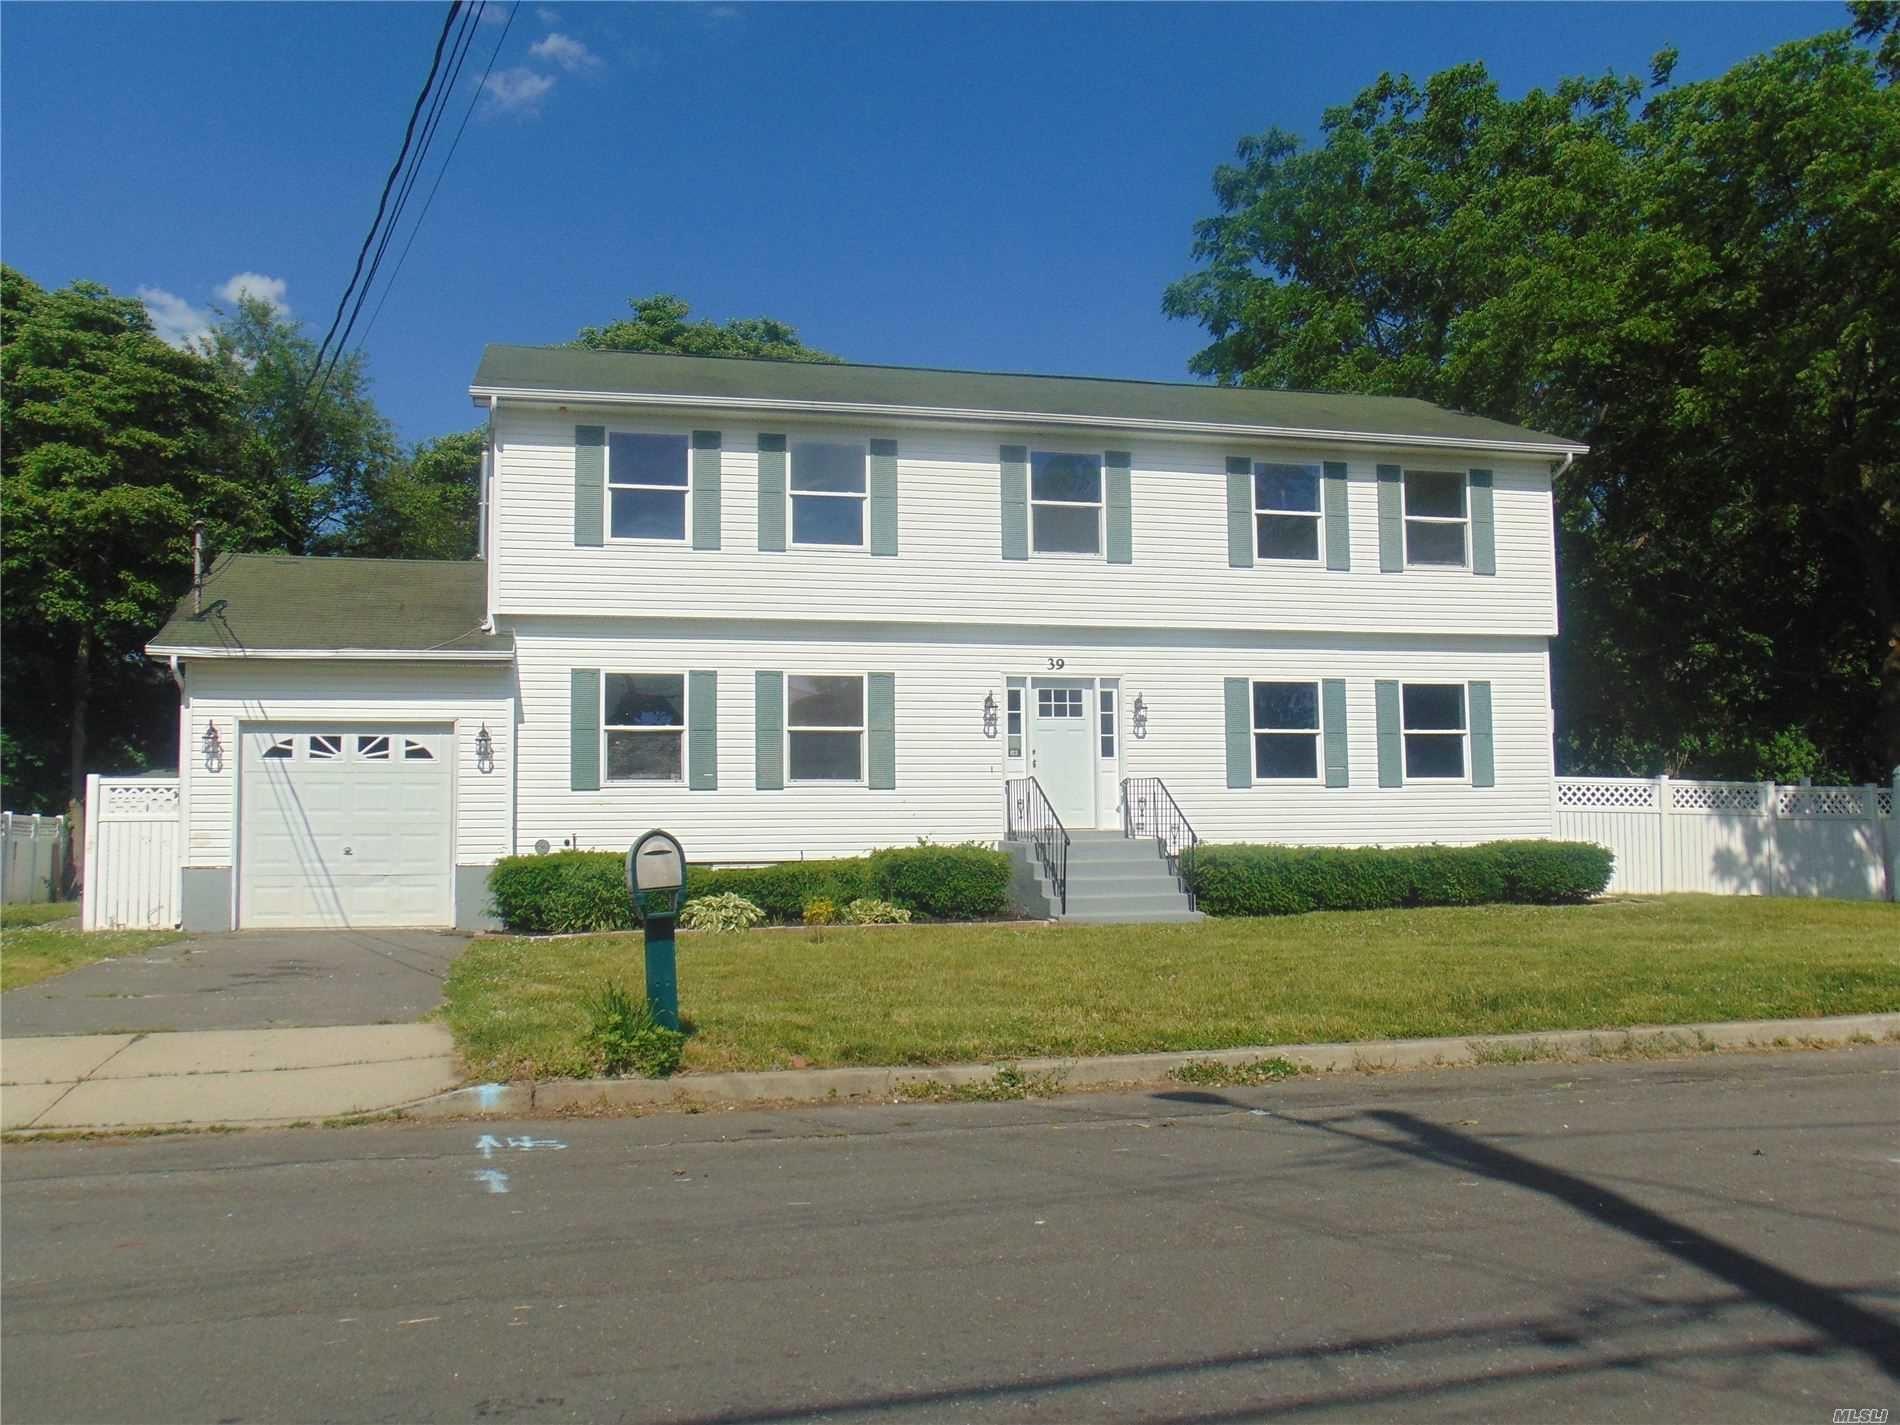 39 S 23 Street, Wyandanch, NY 11798 - MLS#: 3222342